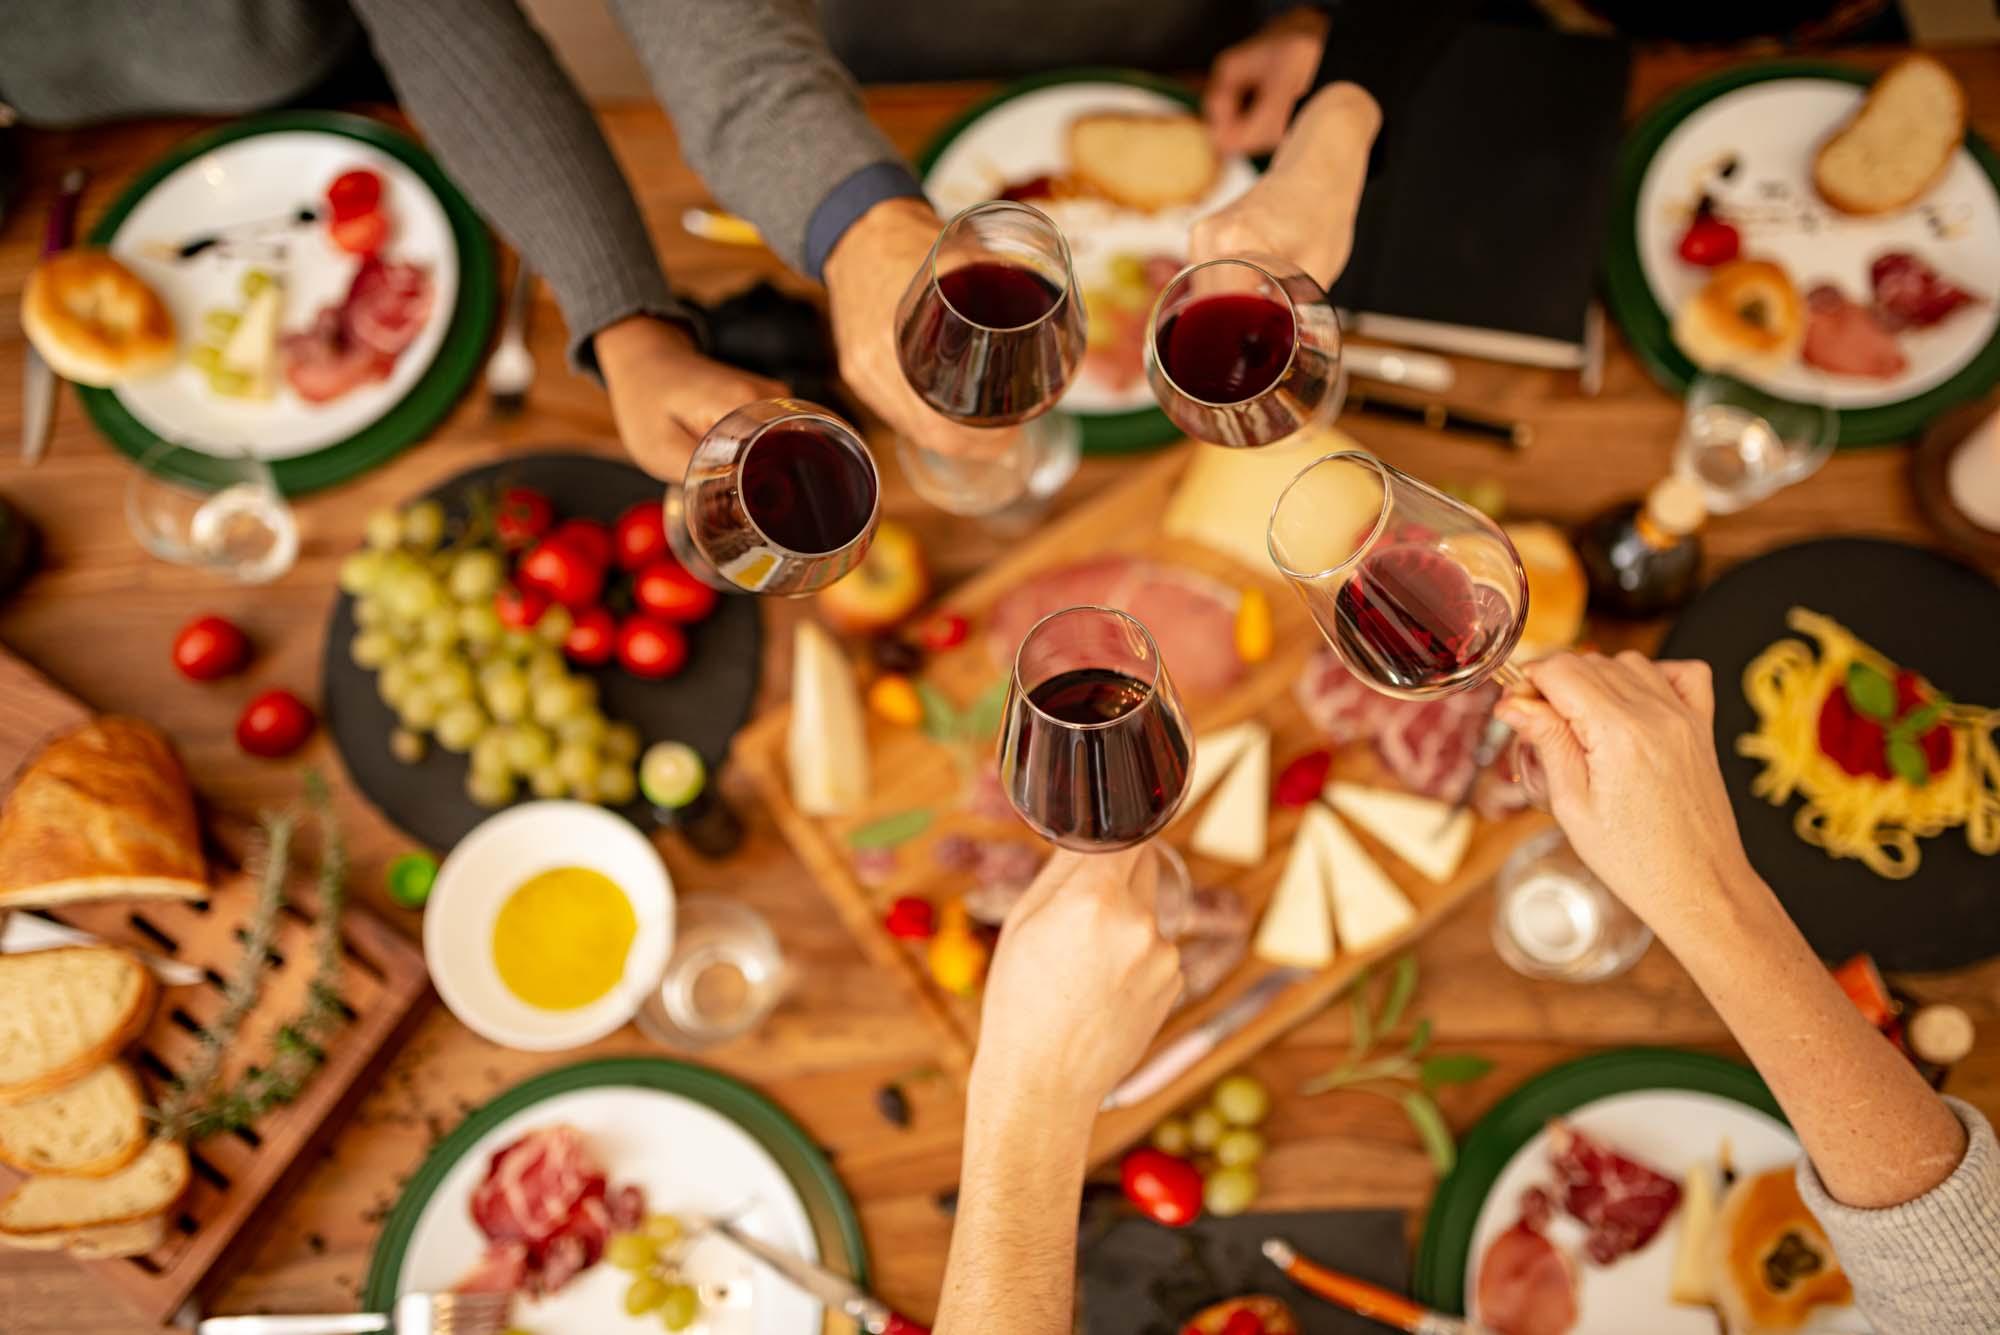 Cucina Amatoriale Formazione Manageriale a Brescia